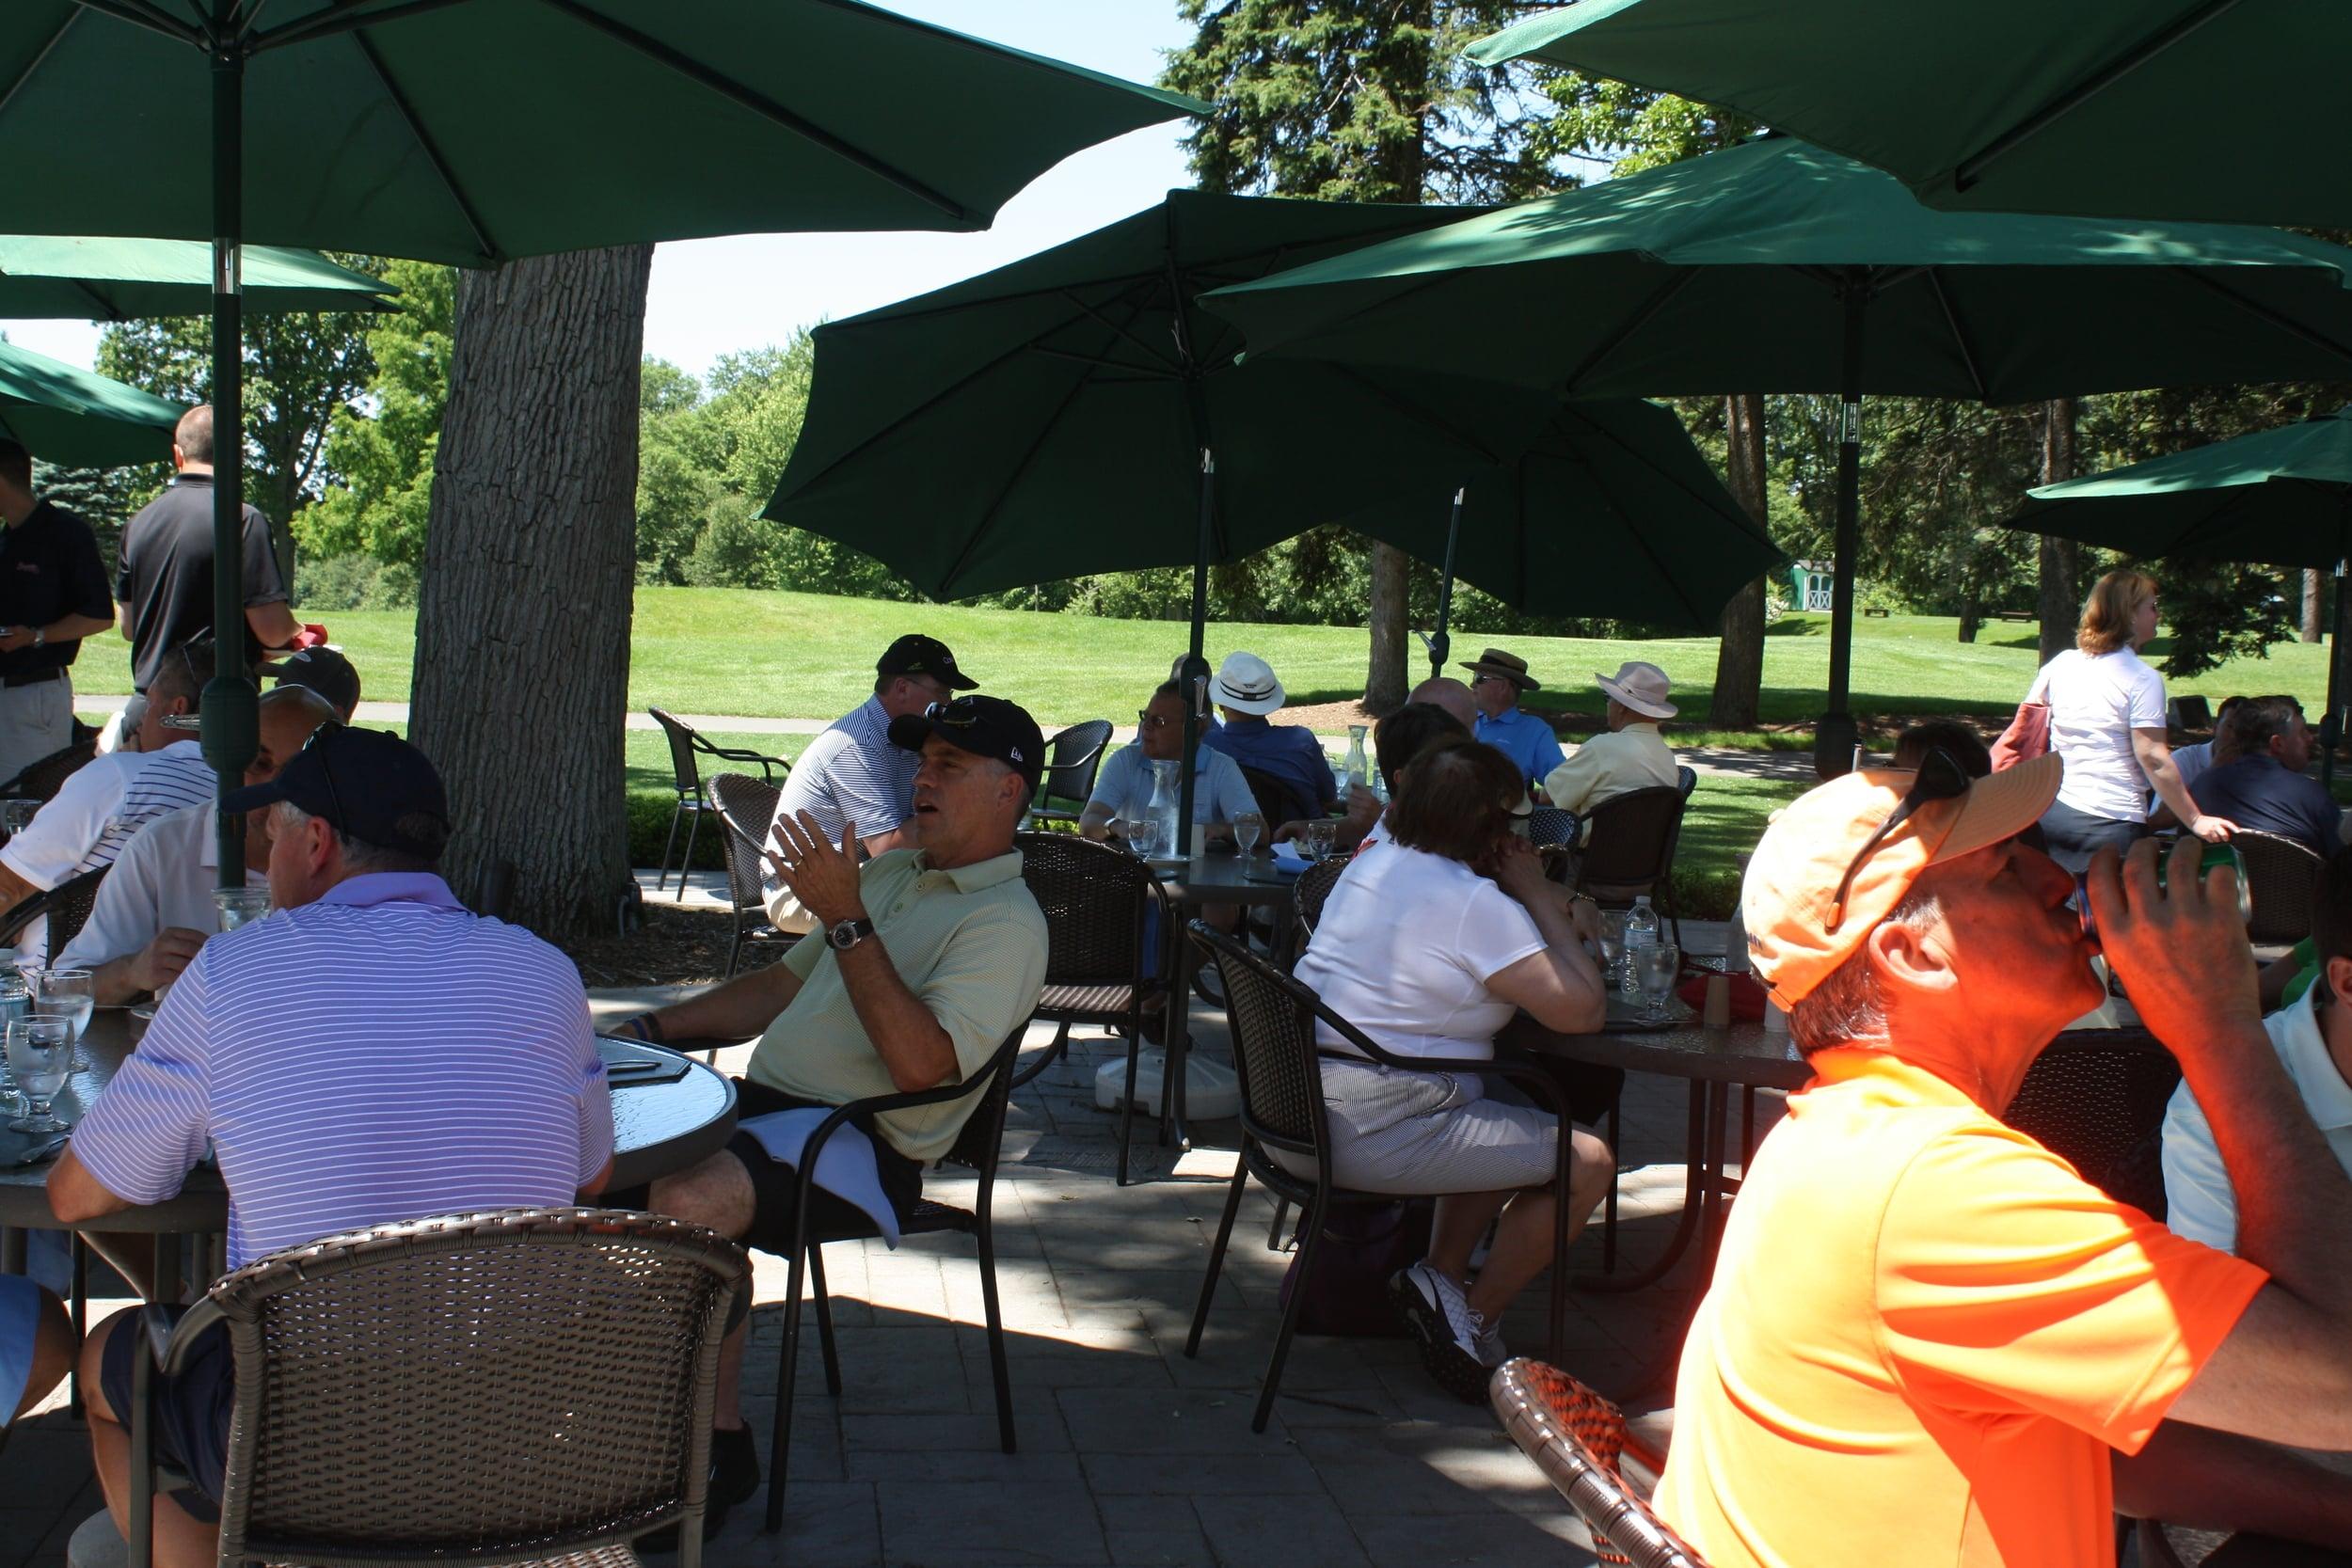 061614 rrcc golf lunch (2).JPG